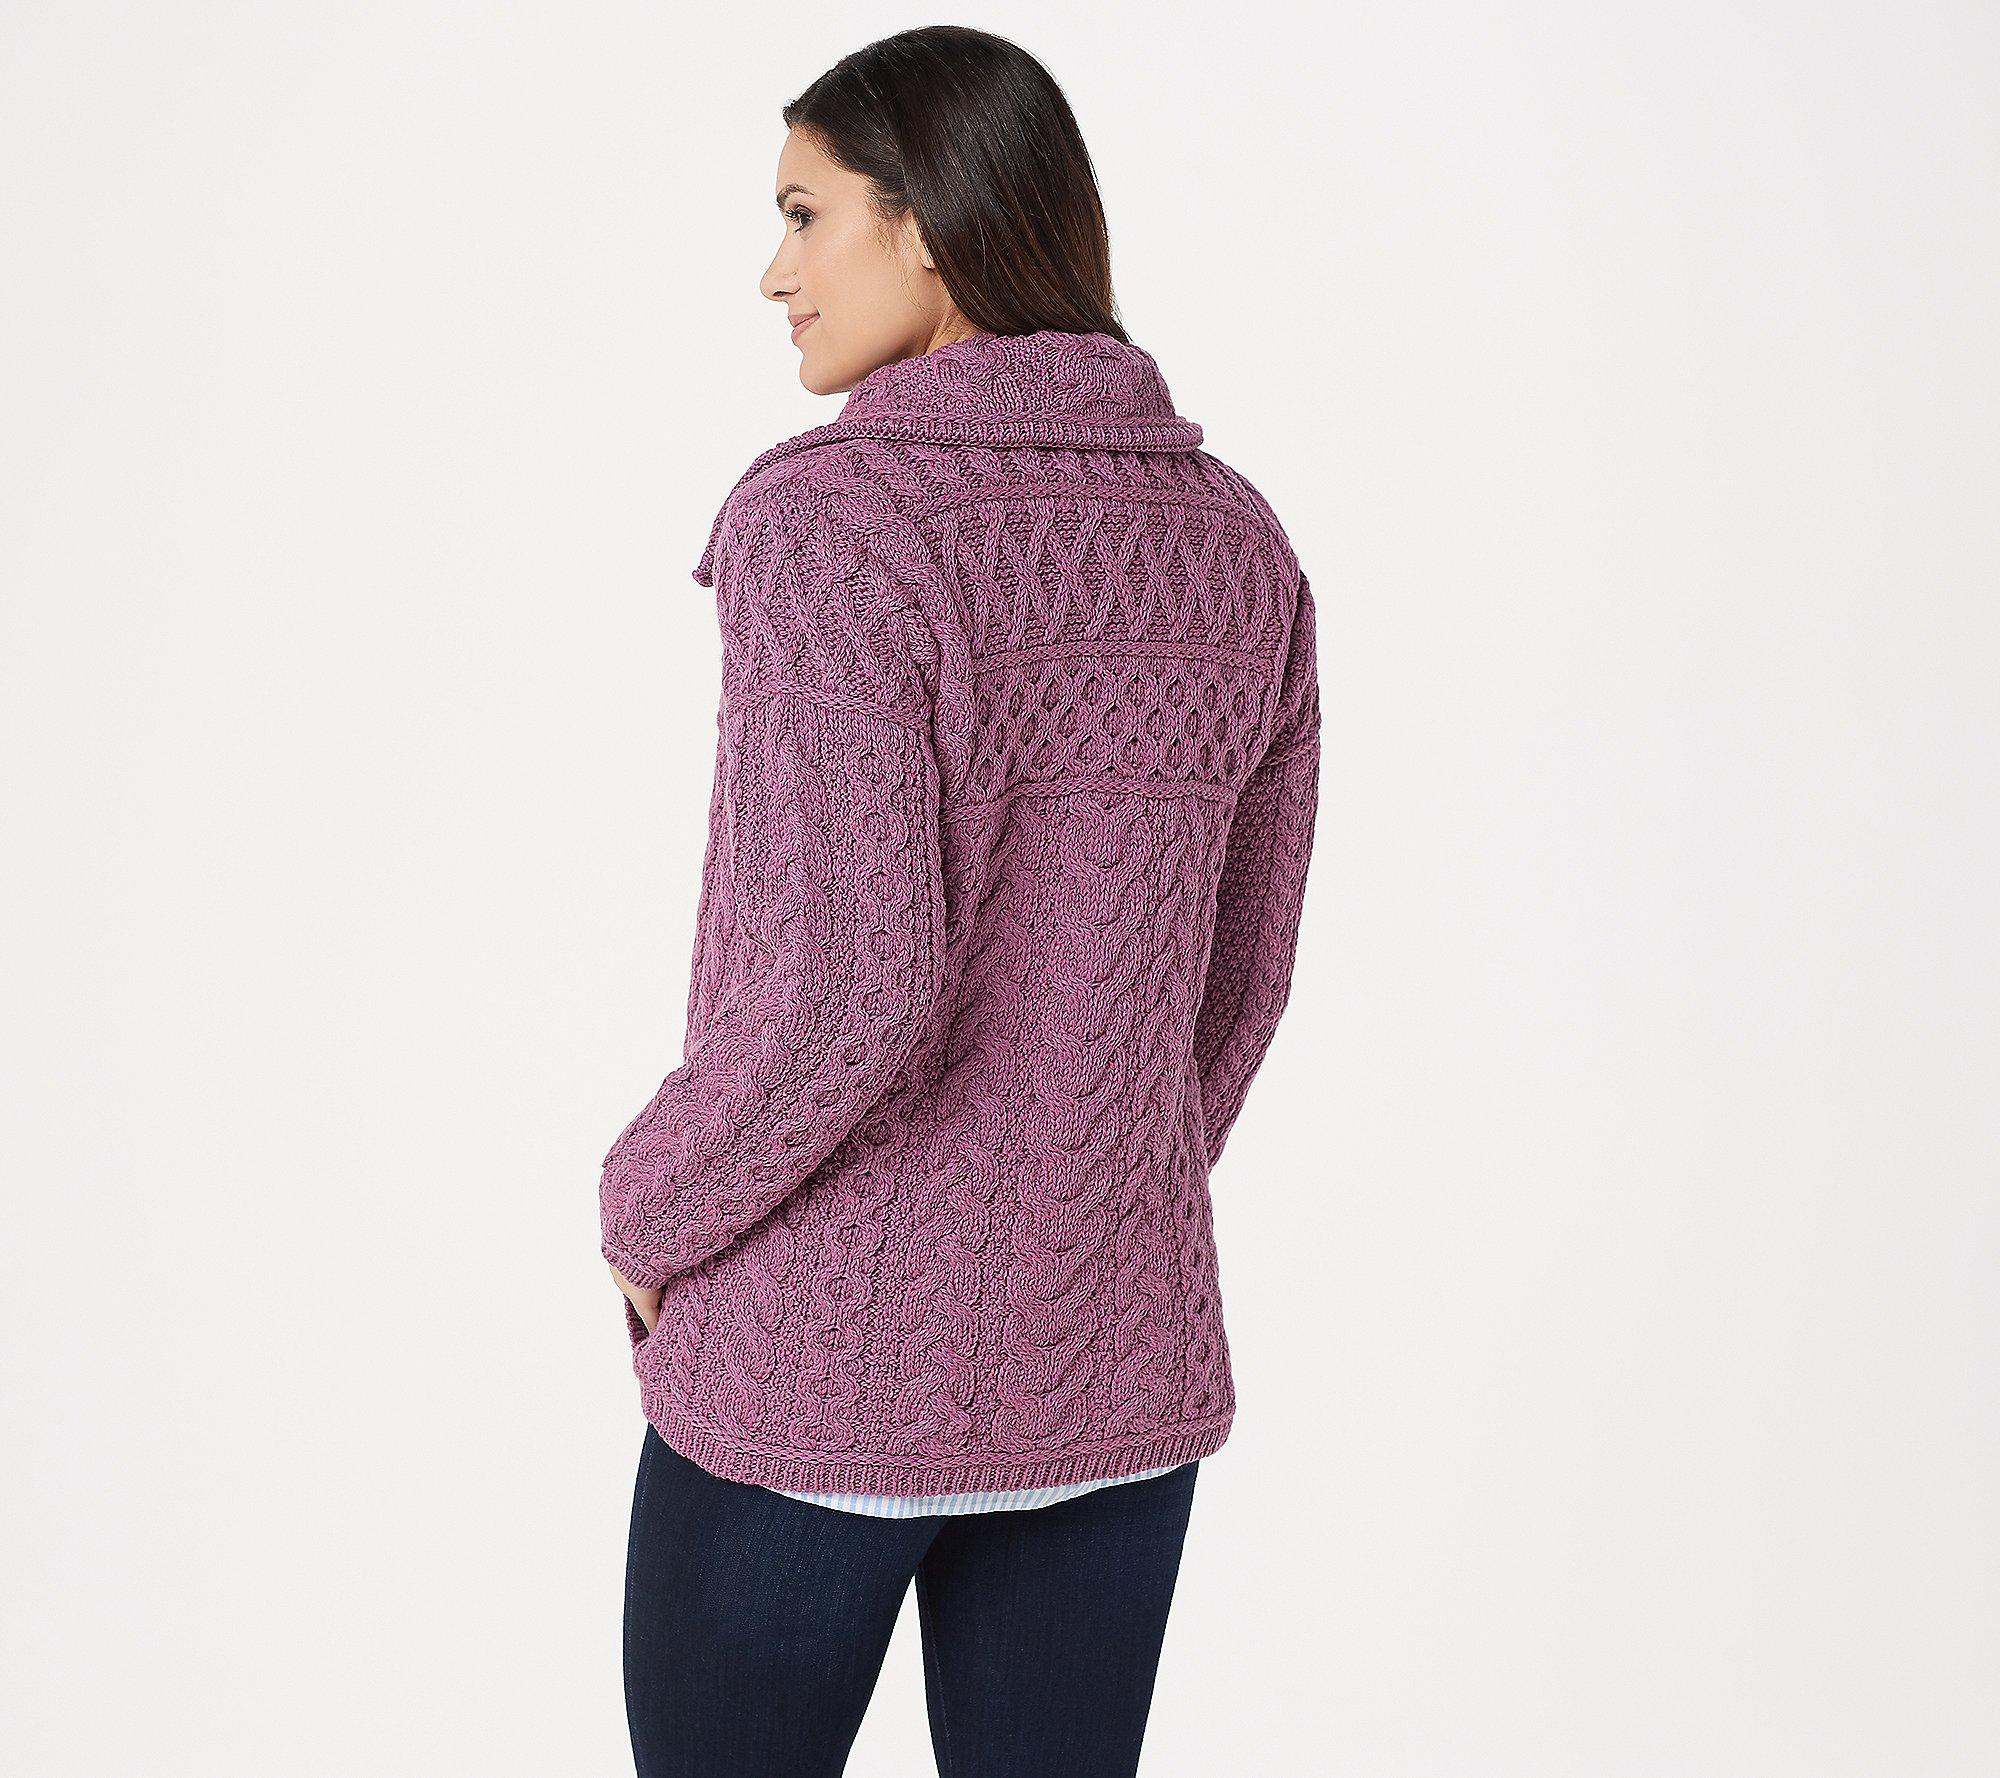 Aran Craft Zip Front Sweater Cardigan Pockets Ecru XS NEW A342709